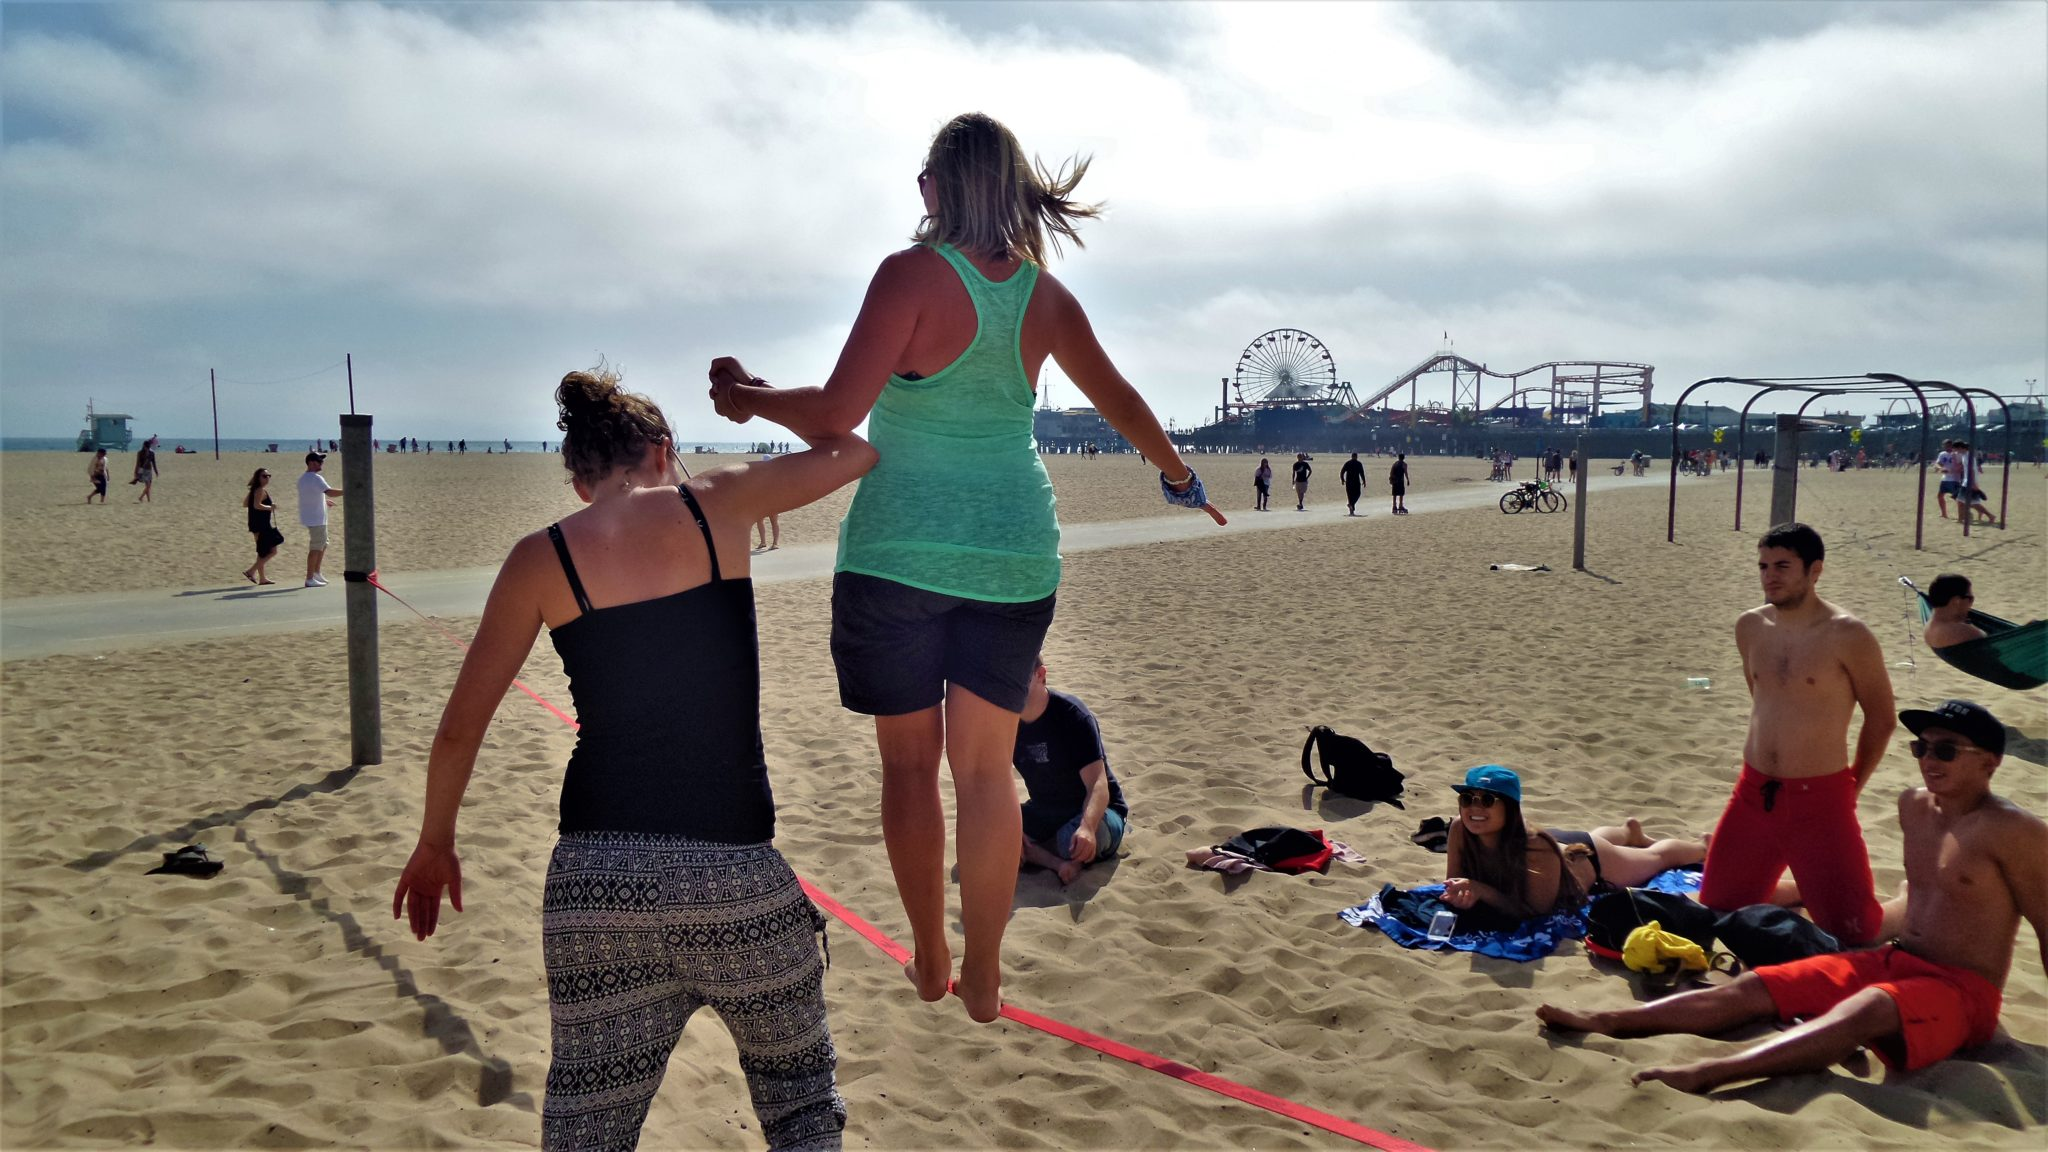 Tightrope walking, santa monica beach, things to do in los angeles